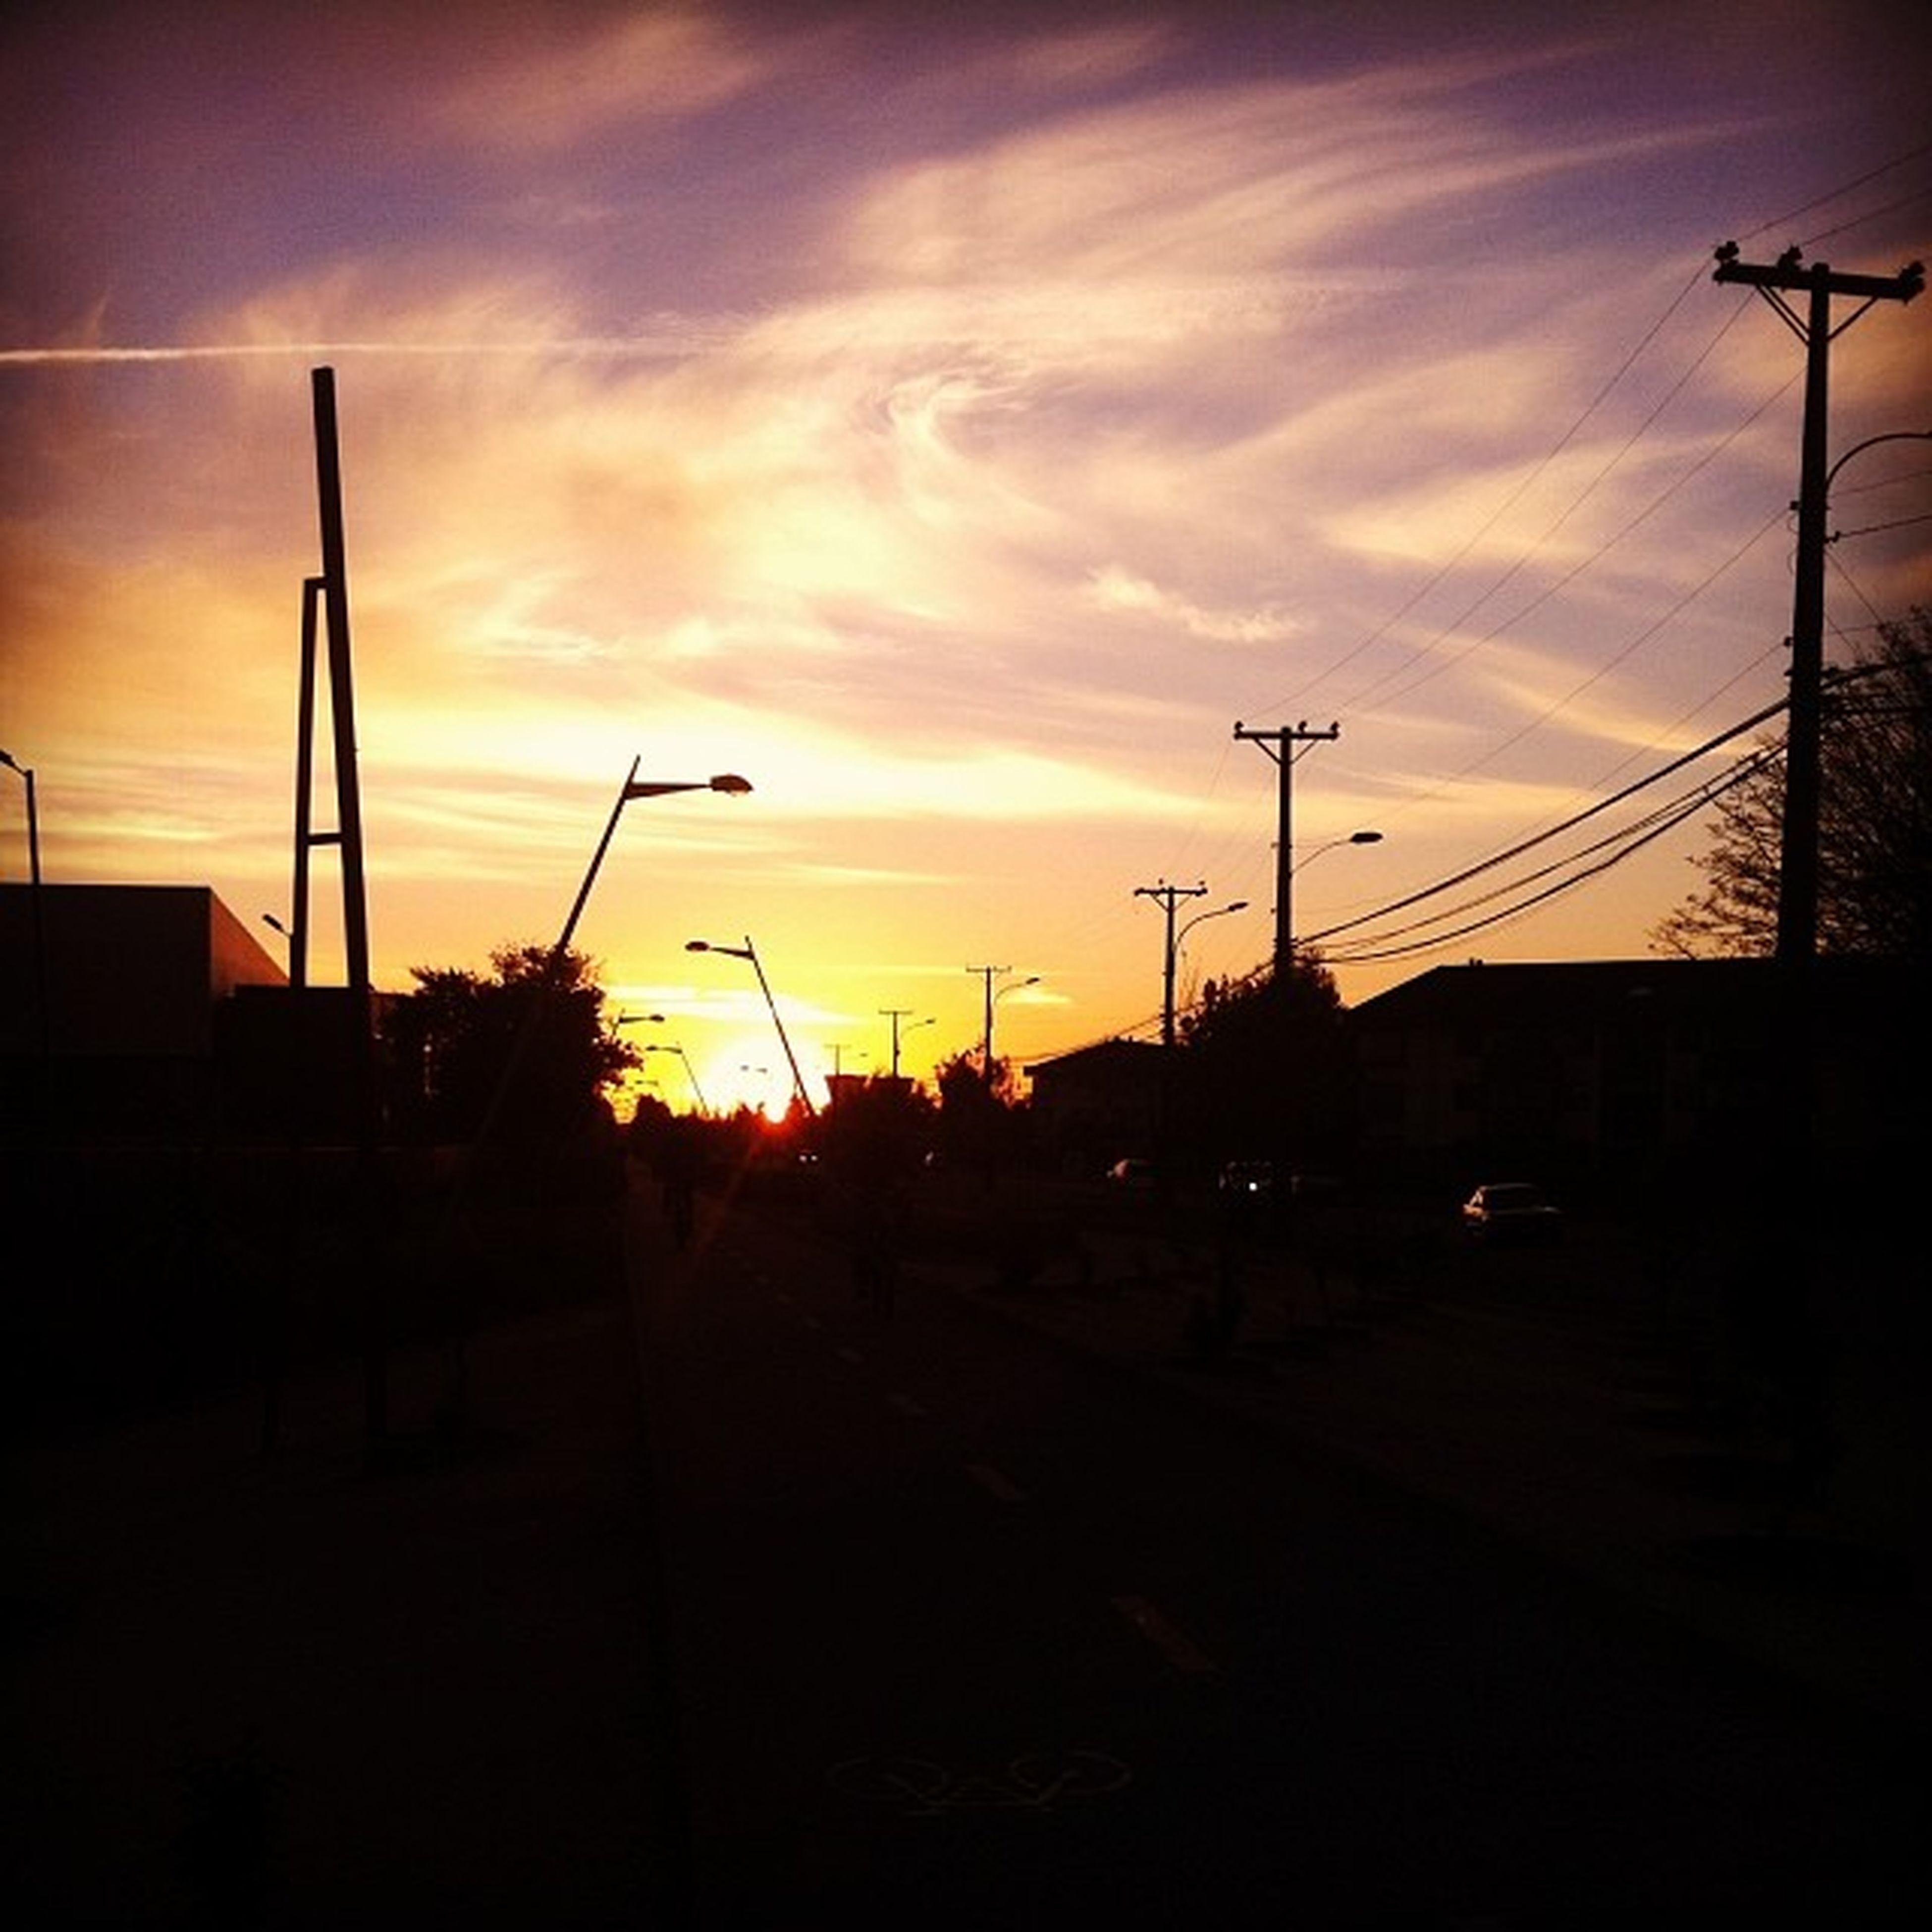 sunset, silhouette, orange color, sky, built structure, building exterior, architecture, street light, transportation, sun, electricity pylon, cloud - sky, car, sunlight, road, dark, power line, street, city, connection